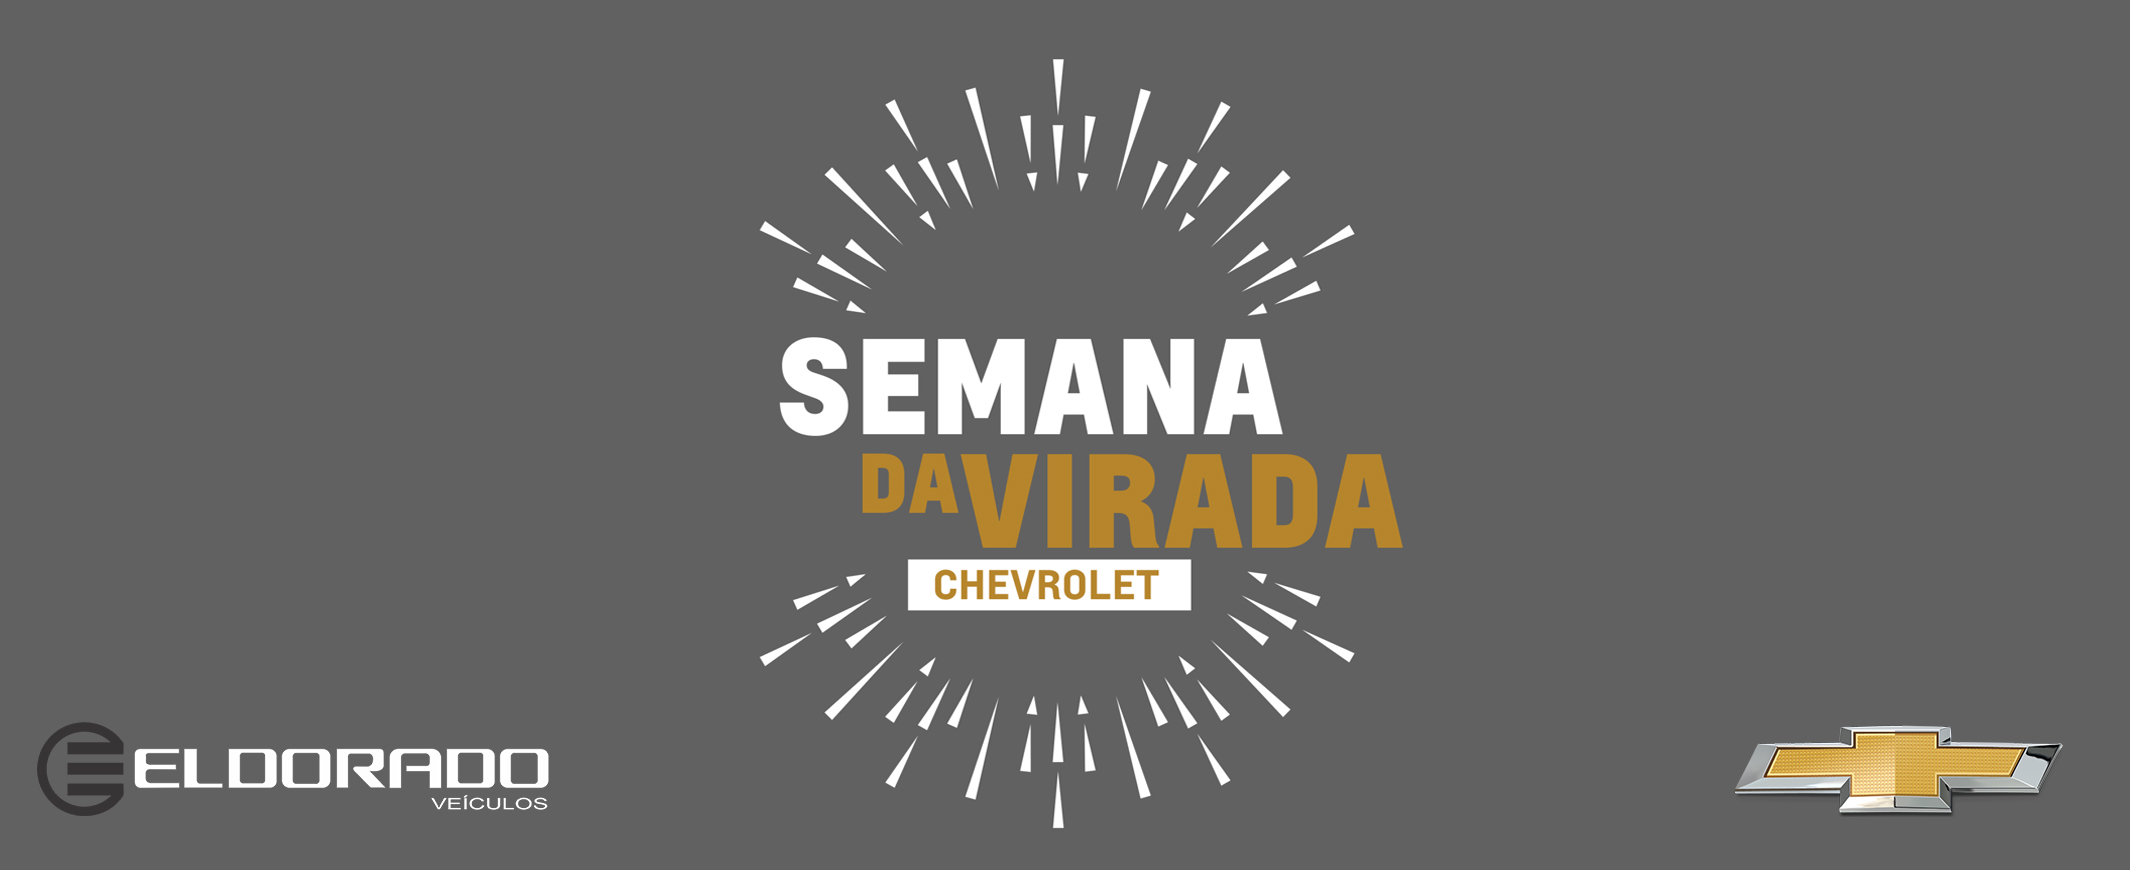 Semana da Virada Chevrolet